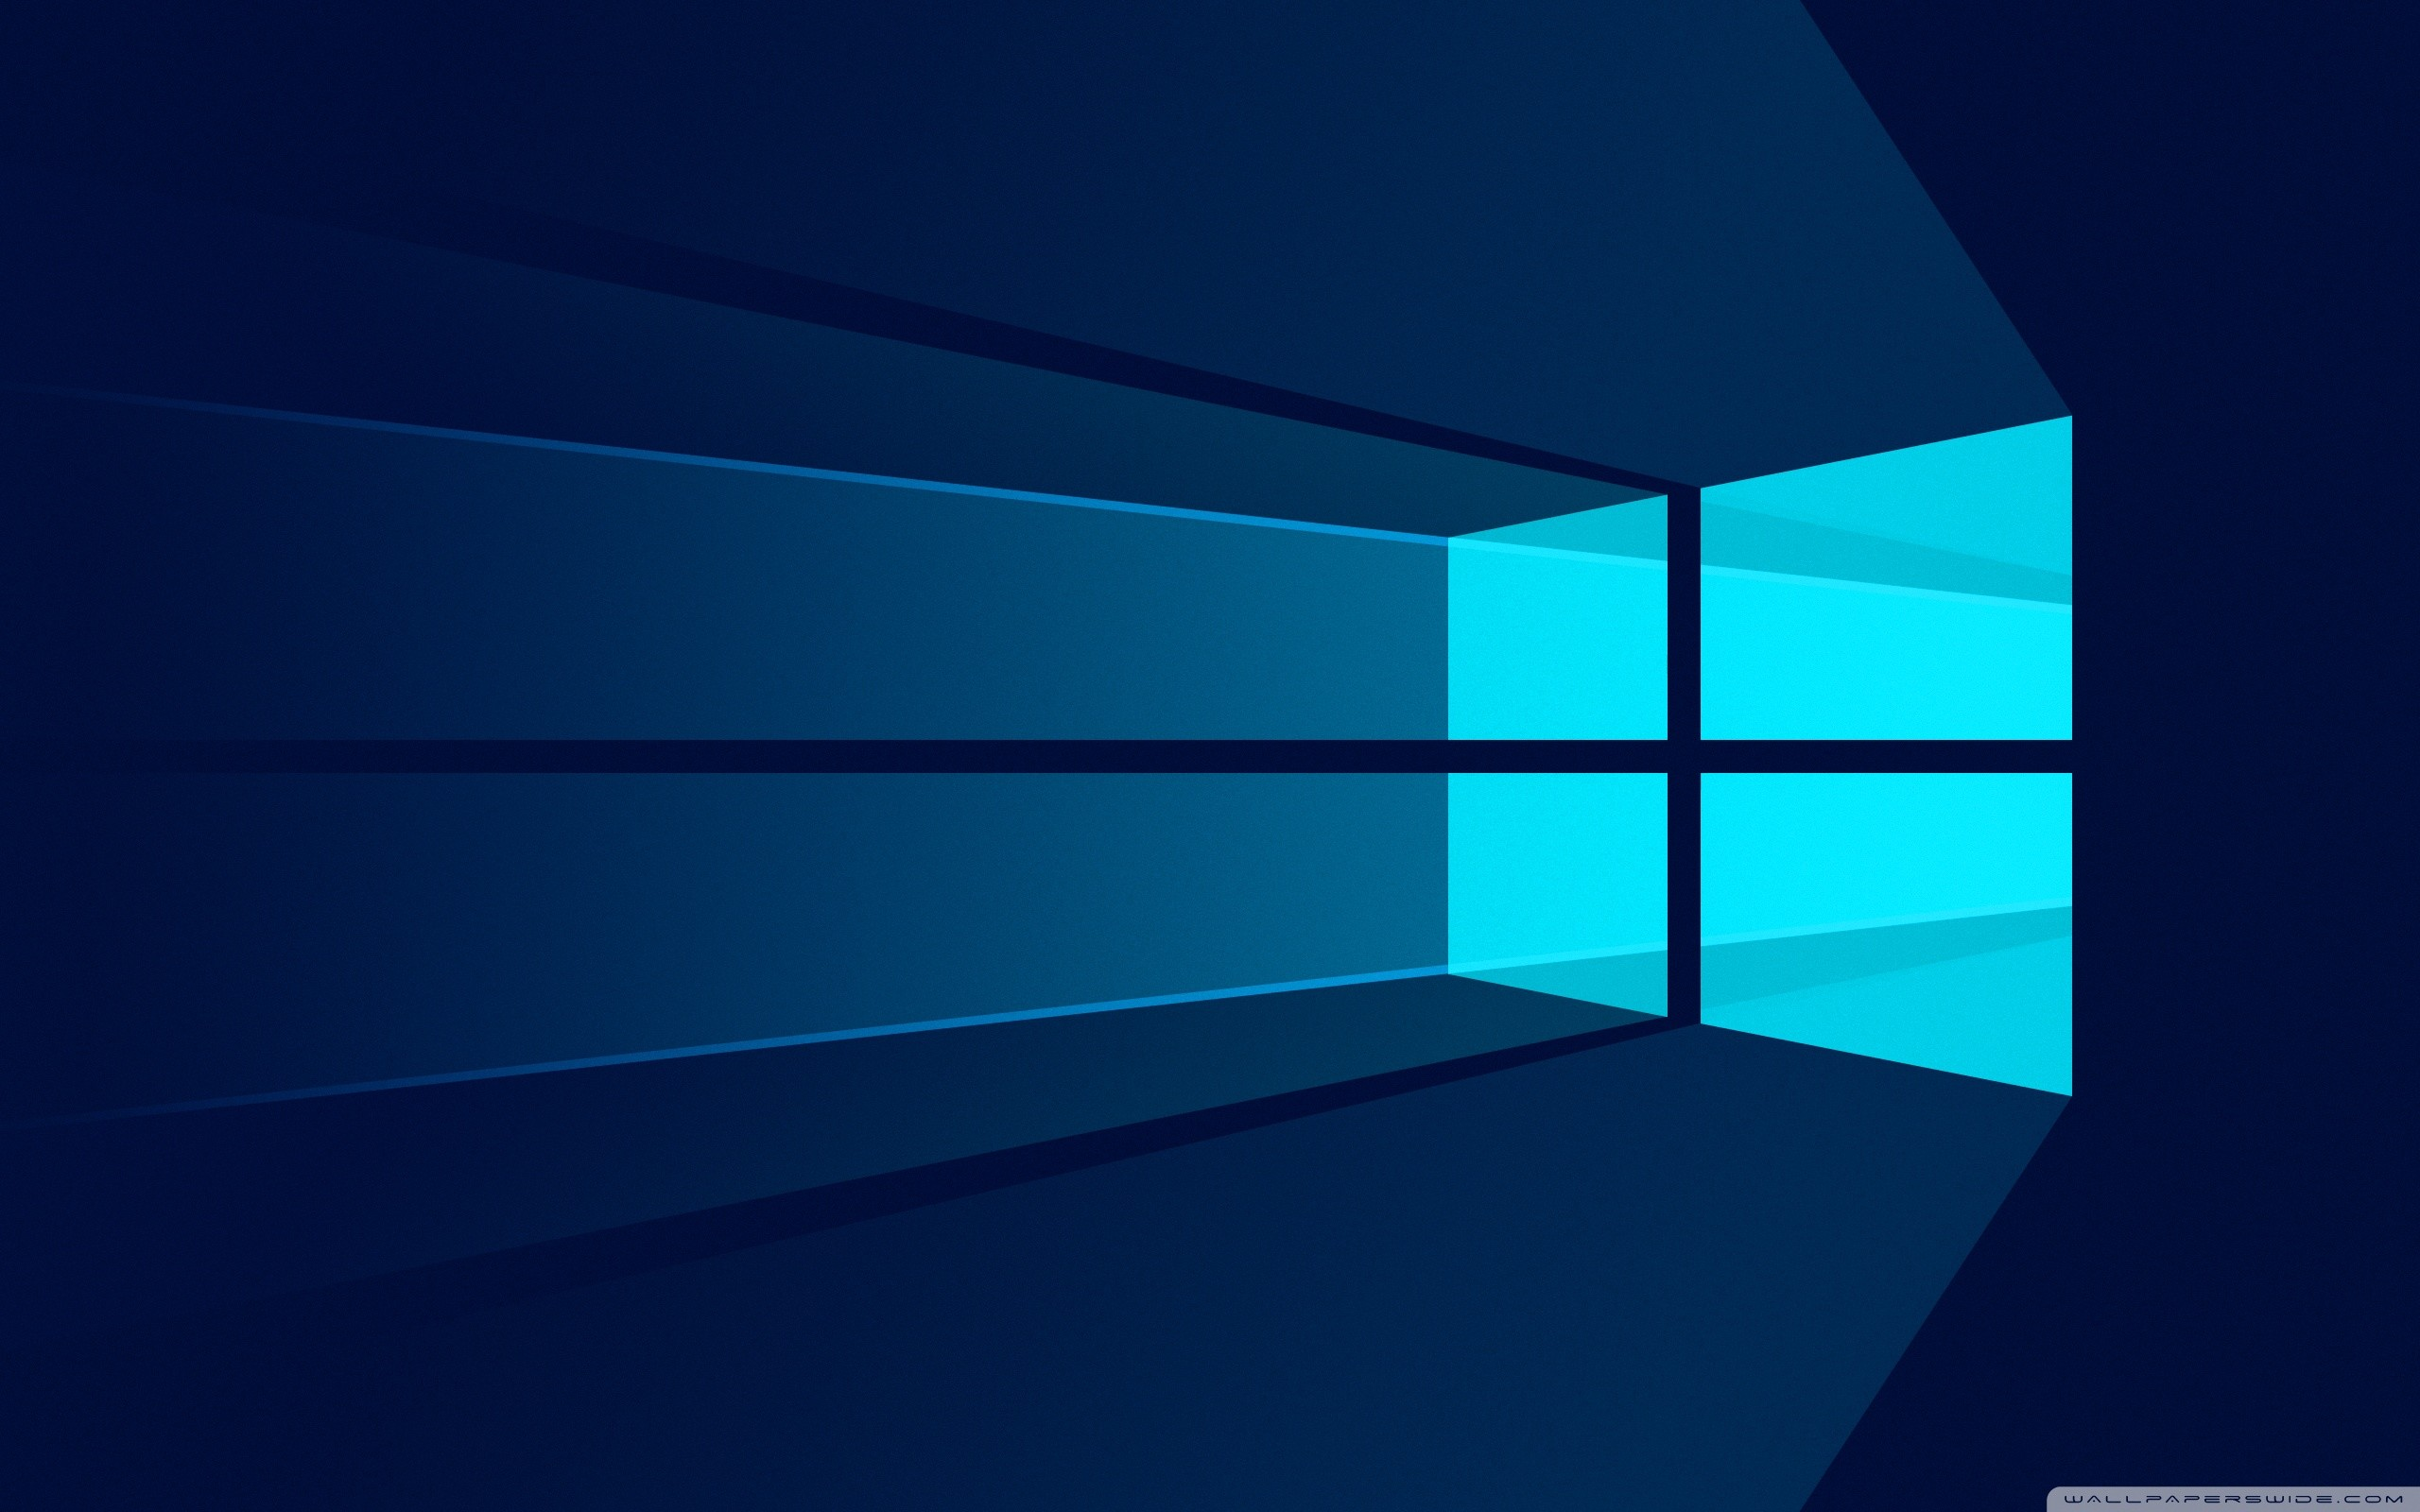 windows wallpaper hd (79+ images)